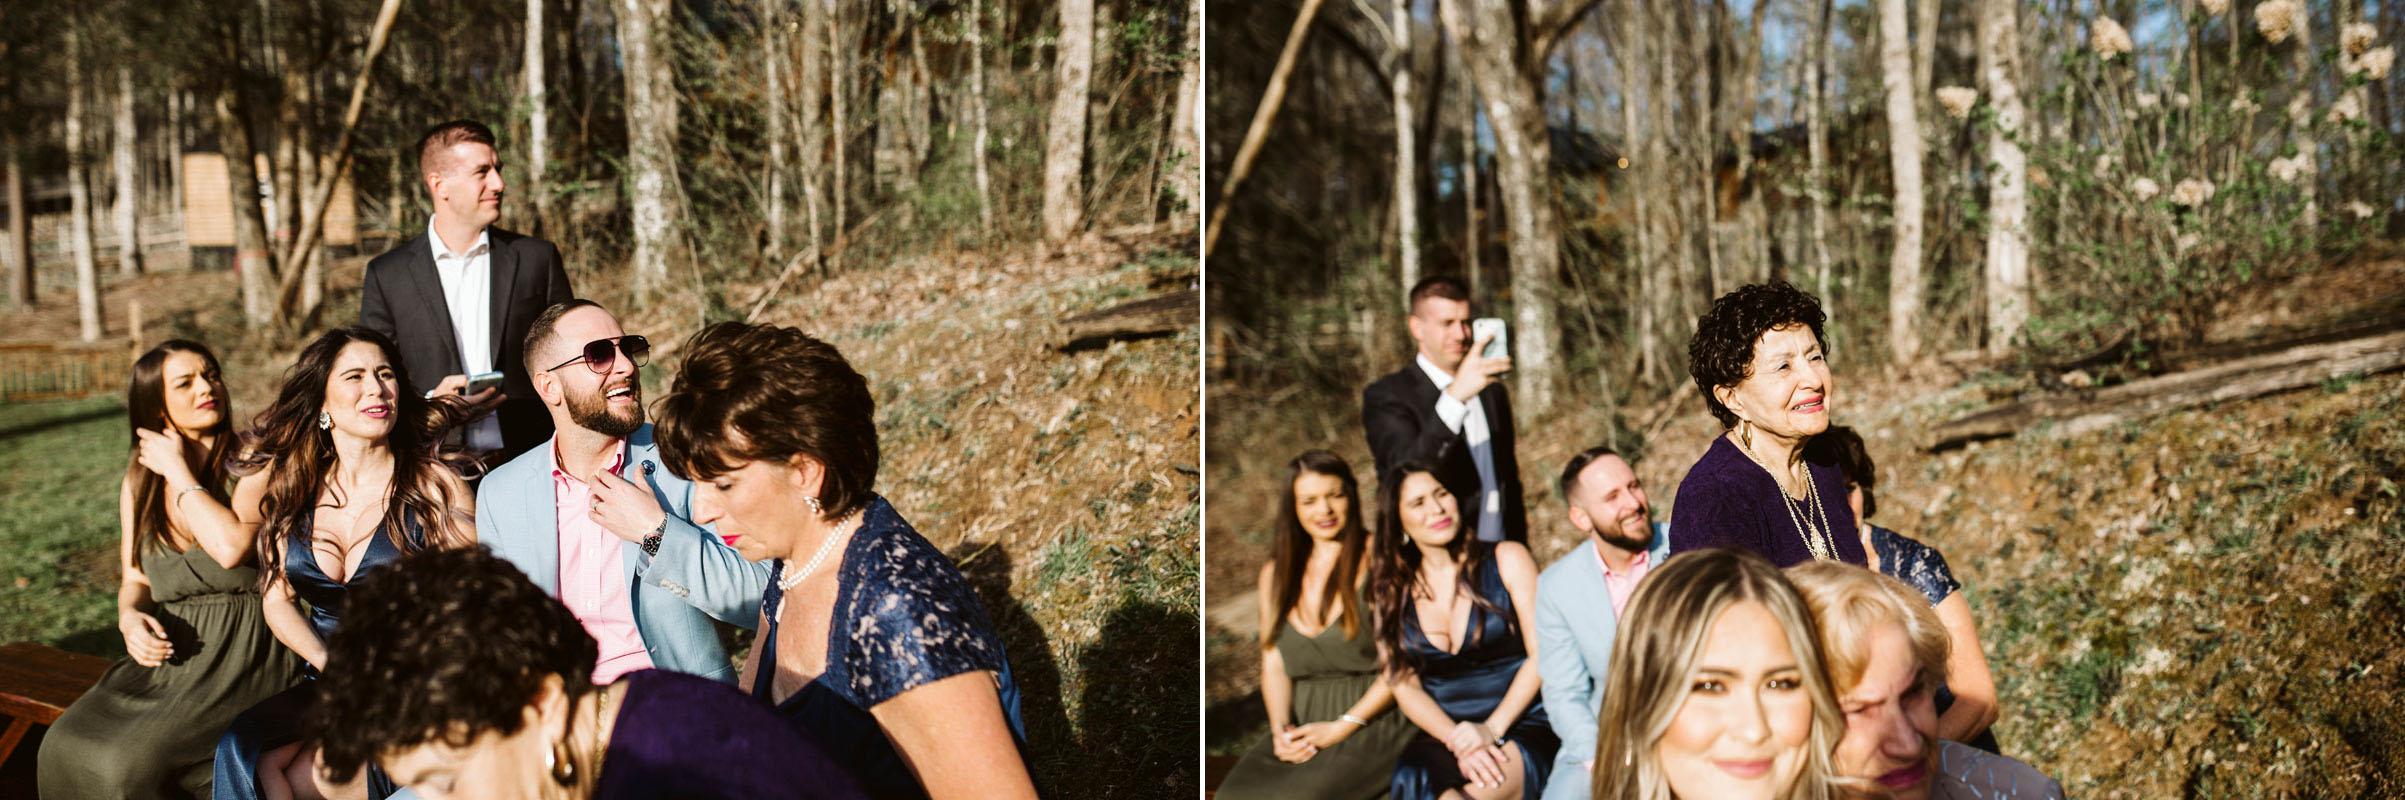 intimate-elopment-blue-ridge-georgia-north-georgia-wedding-photographers (40).jpg